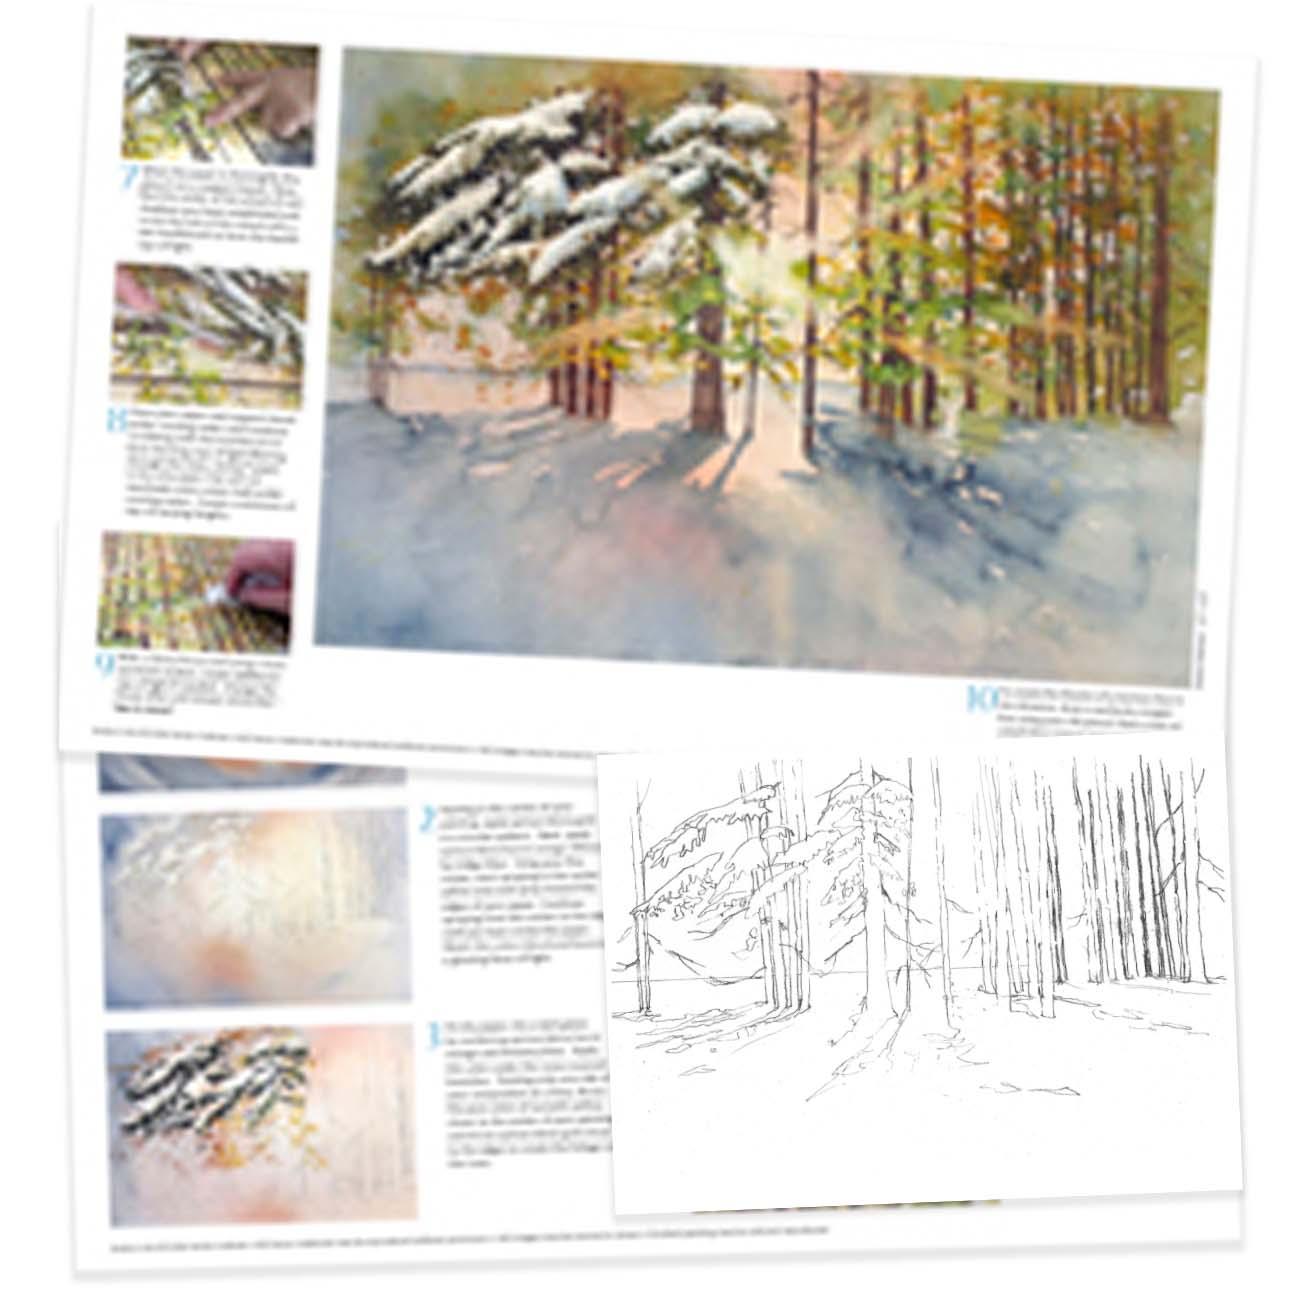 KK079 - Focus of Light on Winter Trees